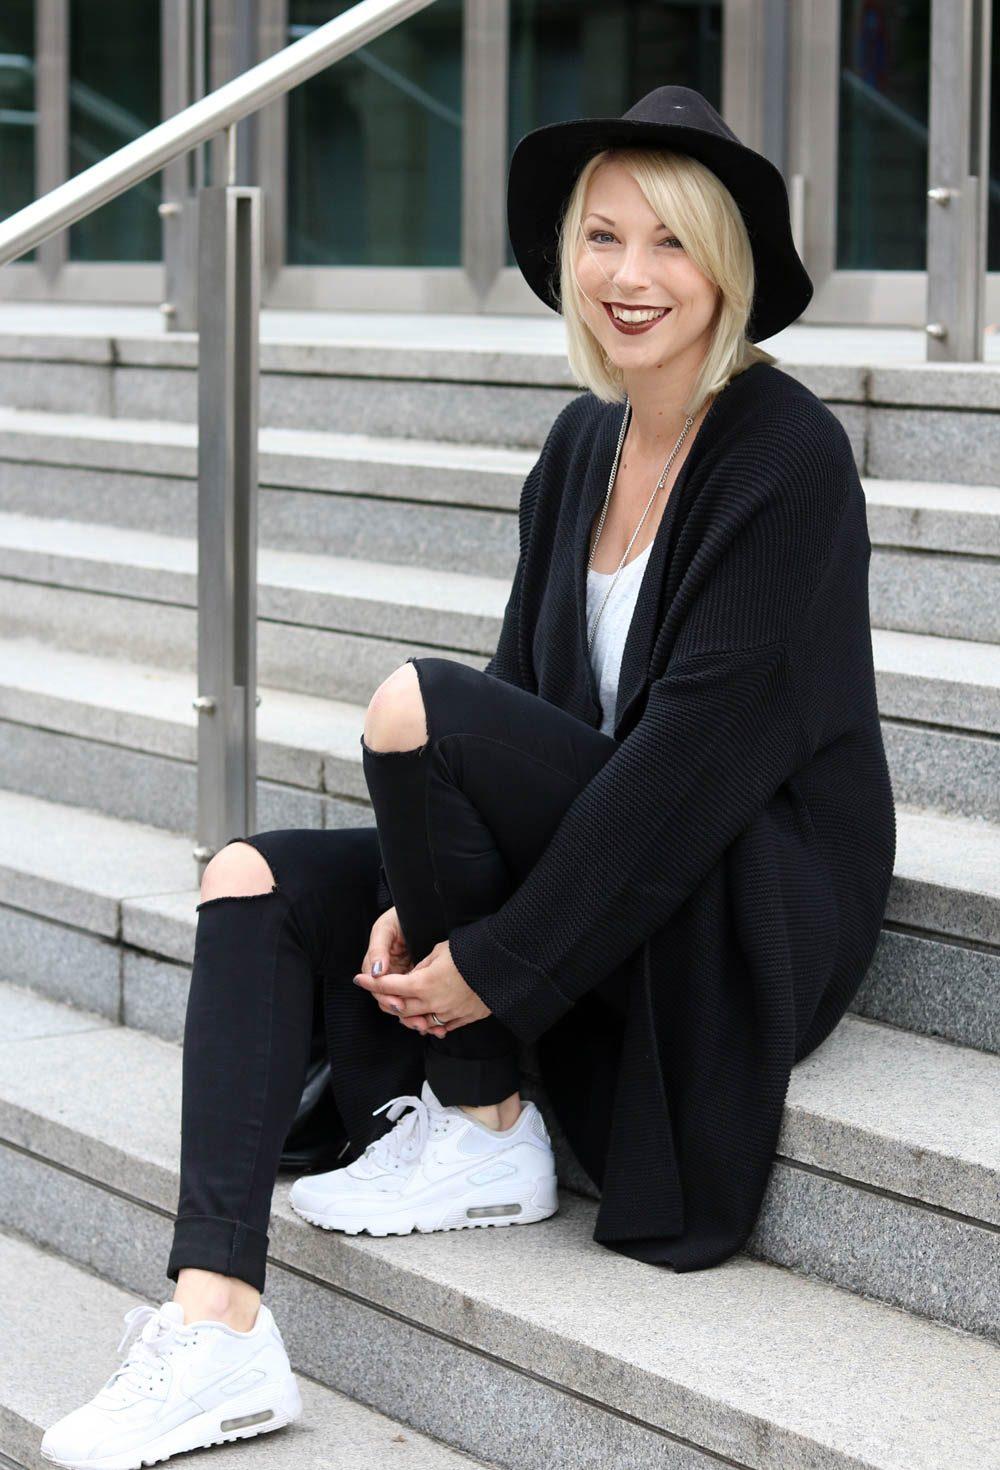 fashionblogger-mannheim-outfit-longcardigan-nike-air-max-skinnyjeans-rucksack-10-von-20